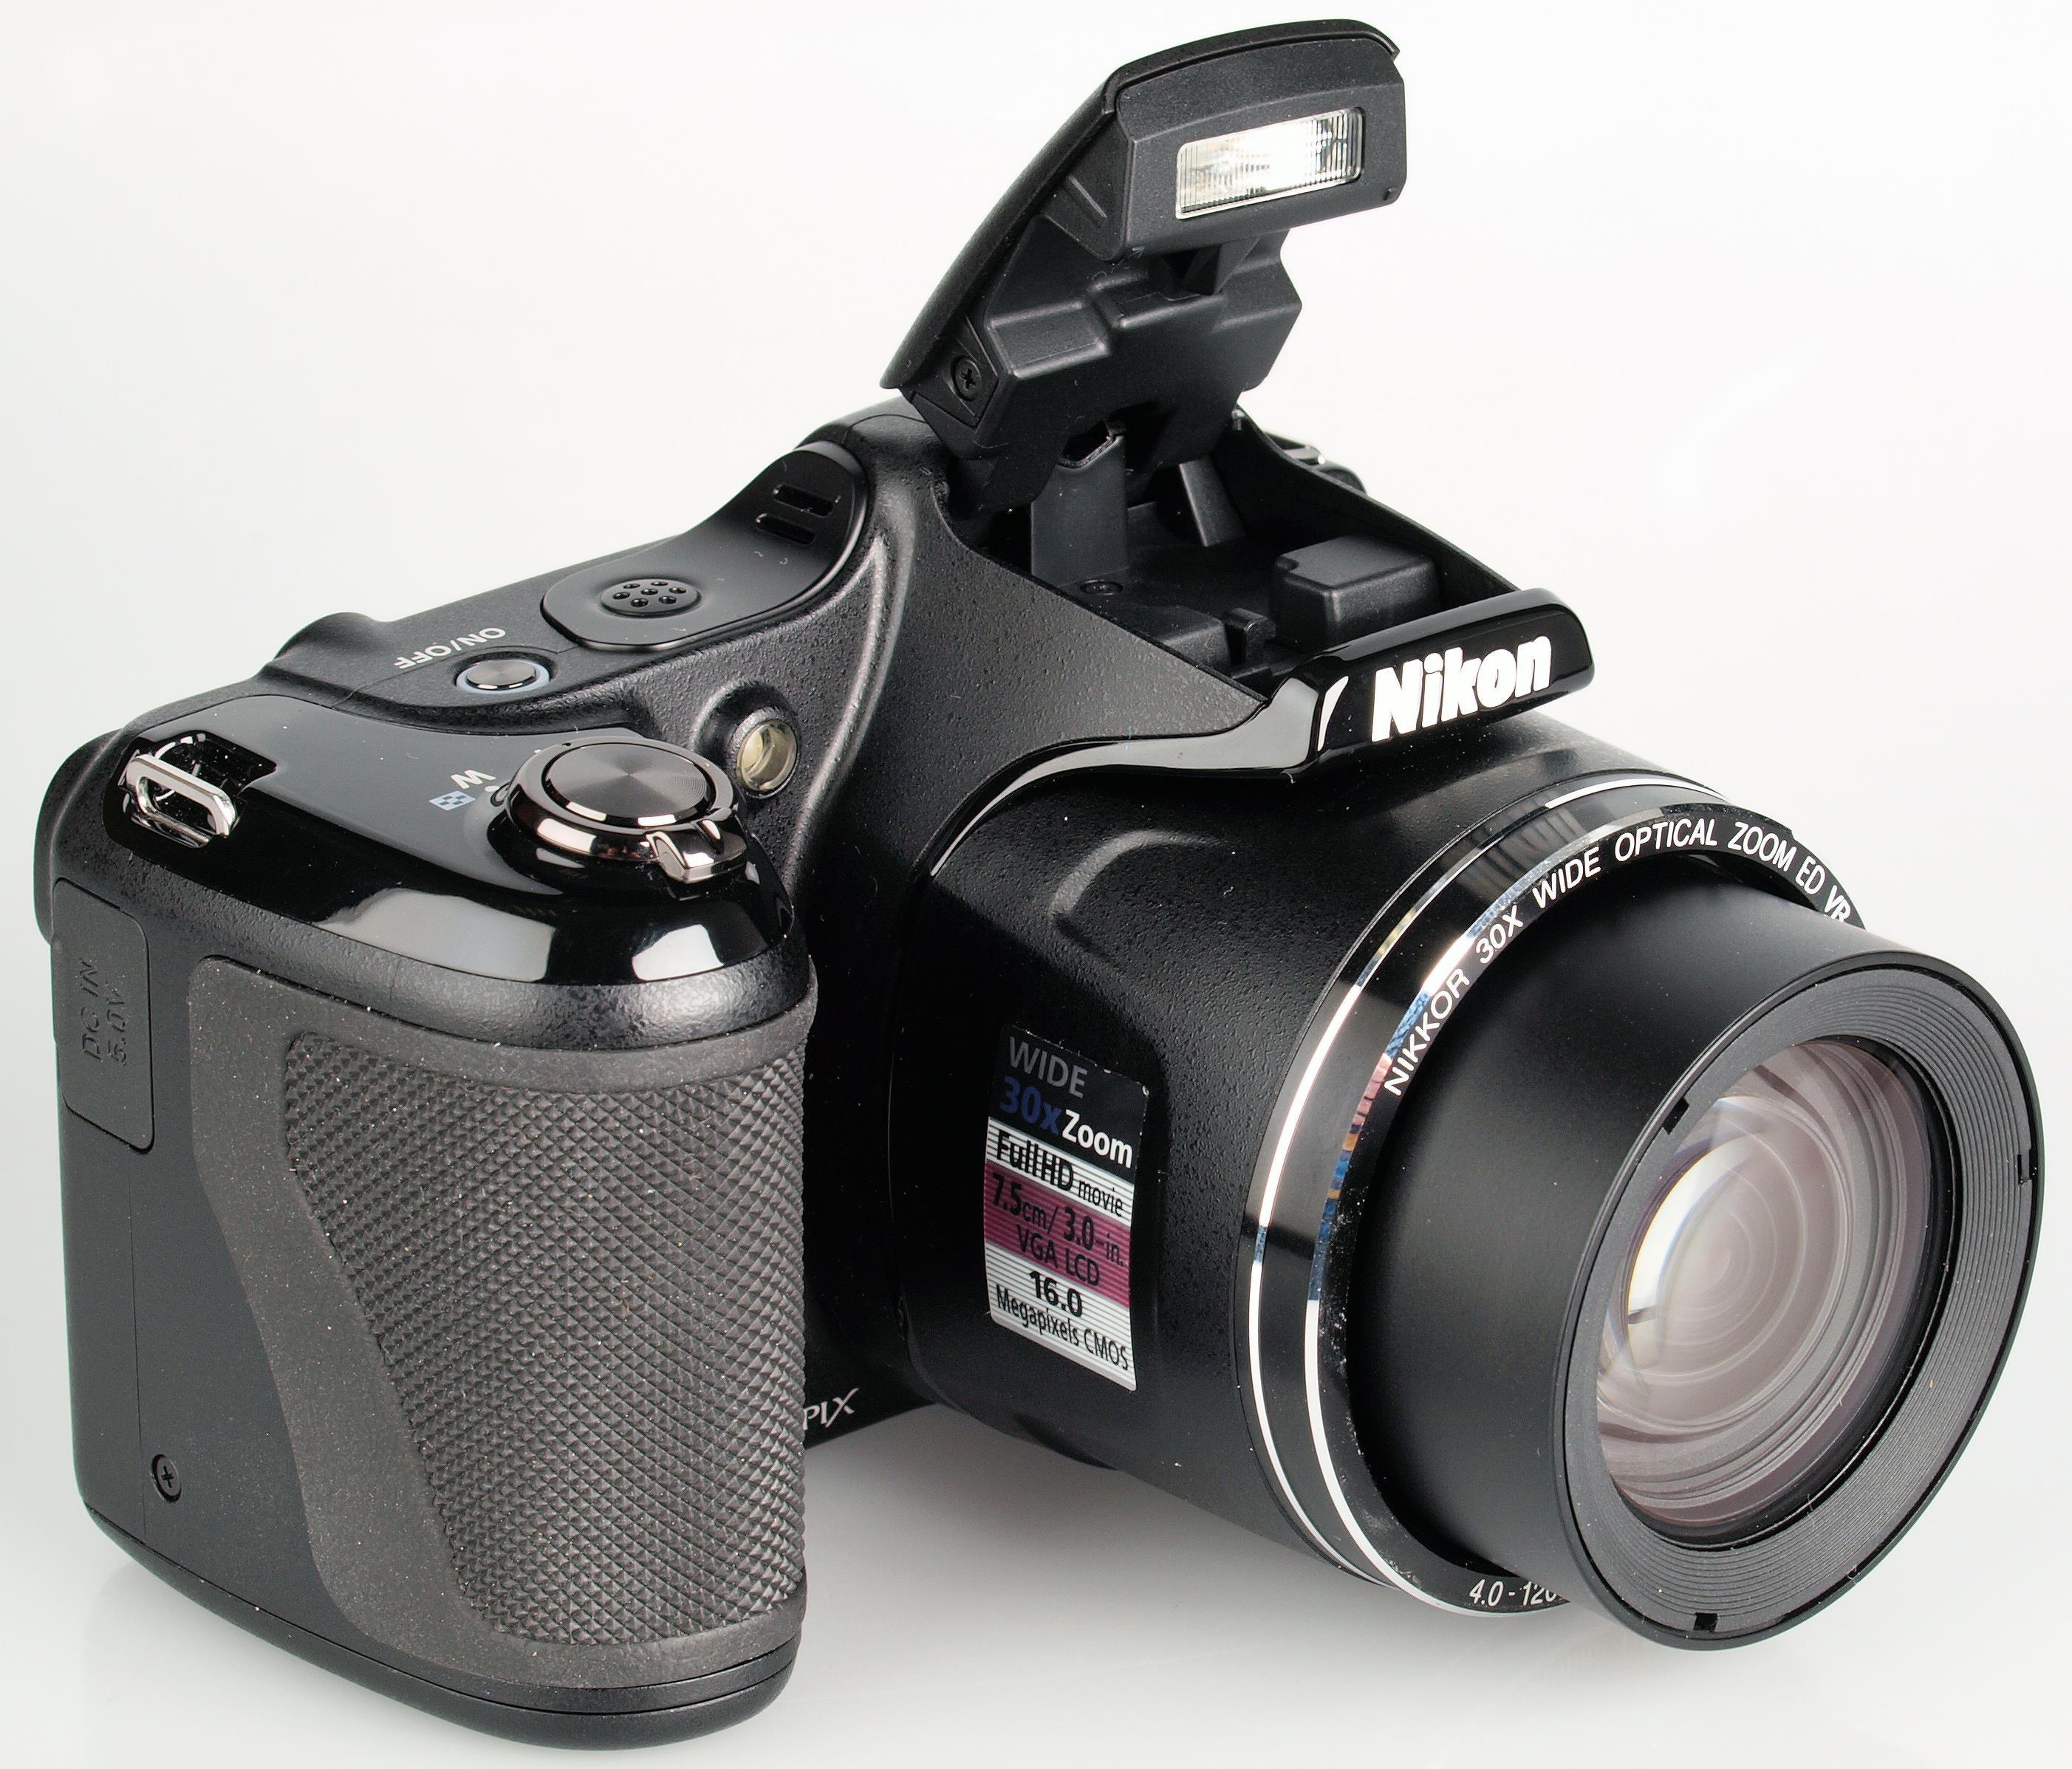 Nikon Coolpix L820 Image